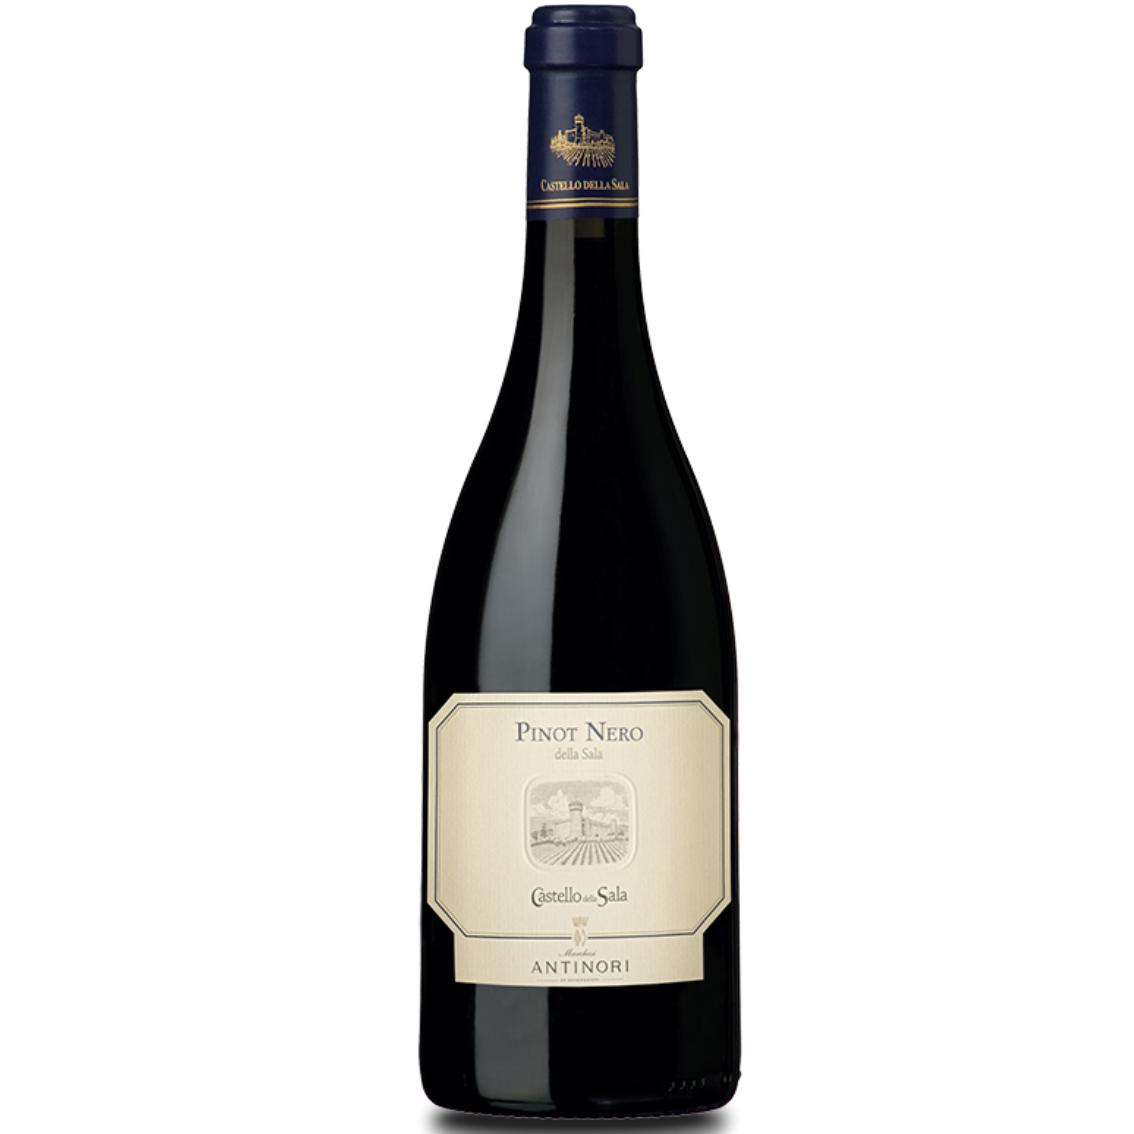 2017 Pinot Nero della Sala - Antinori